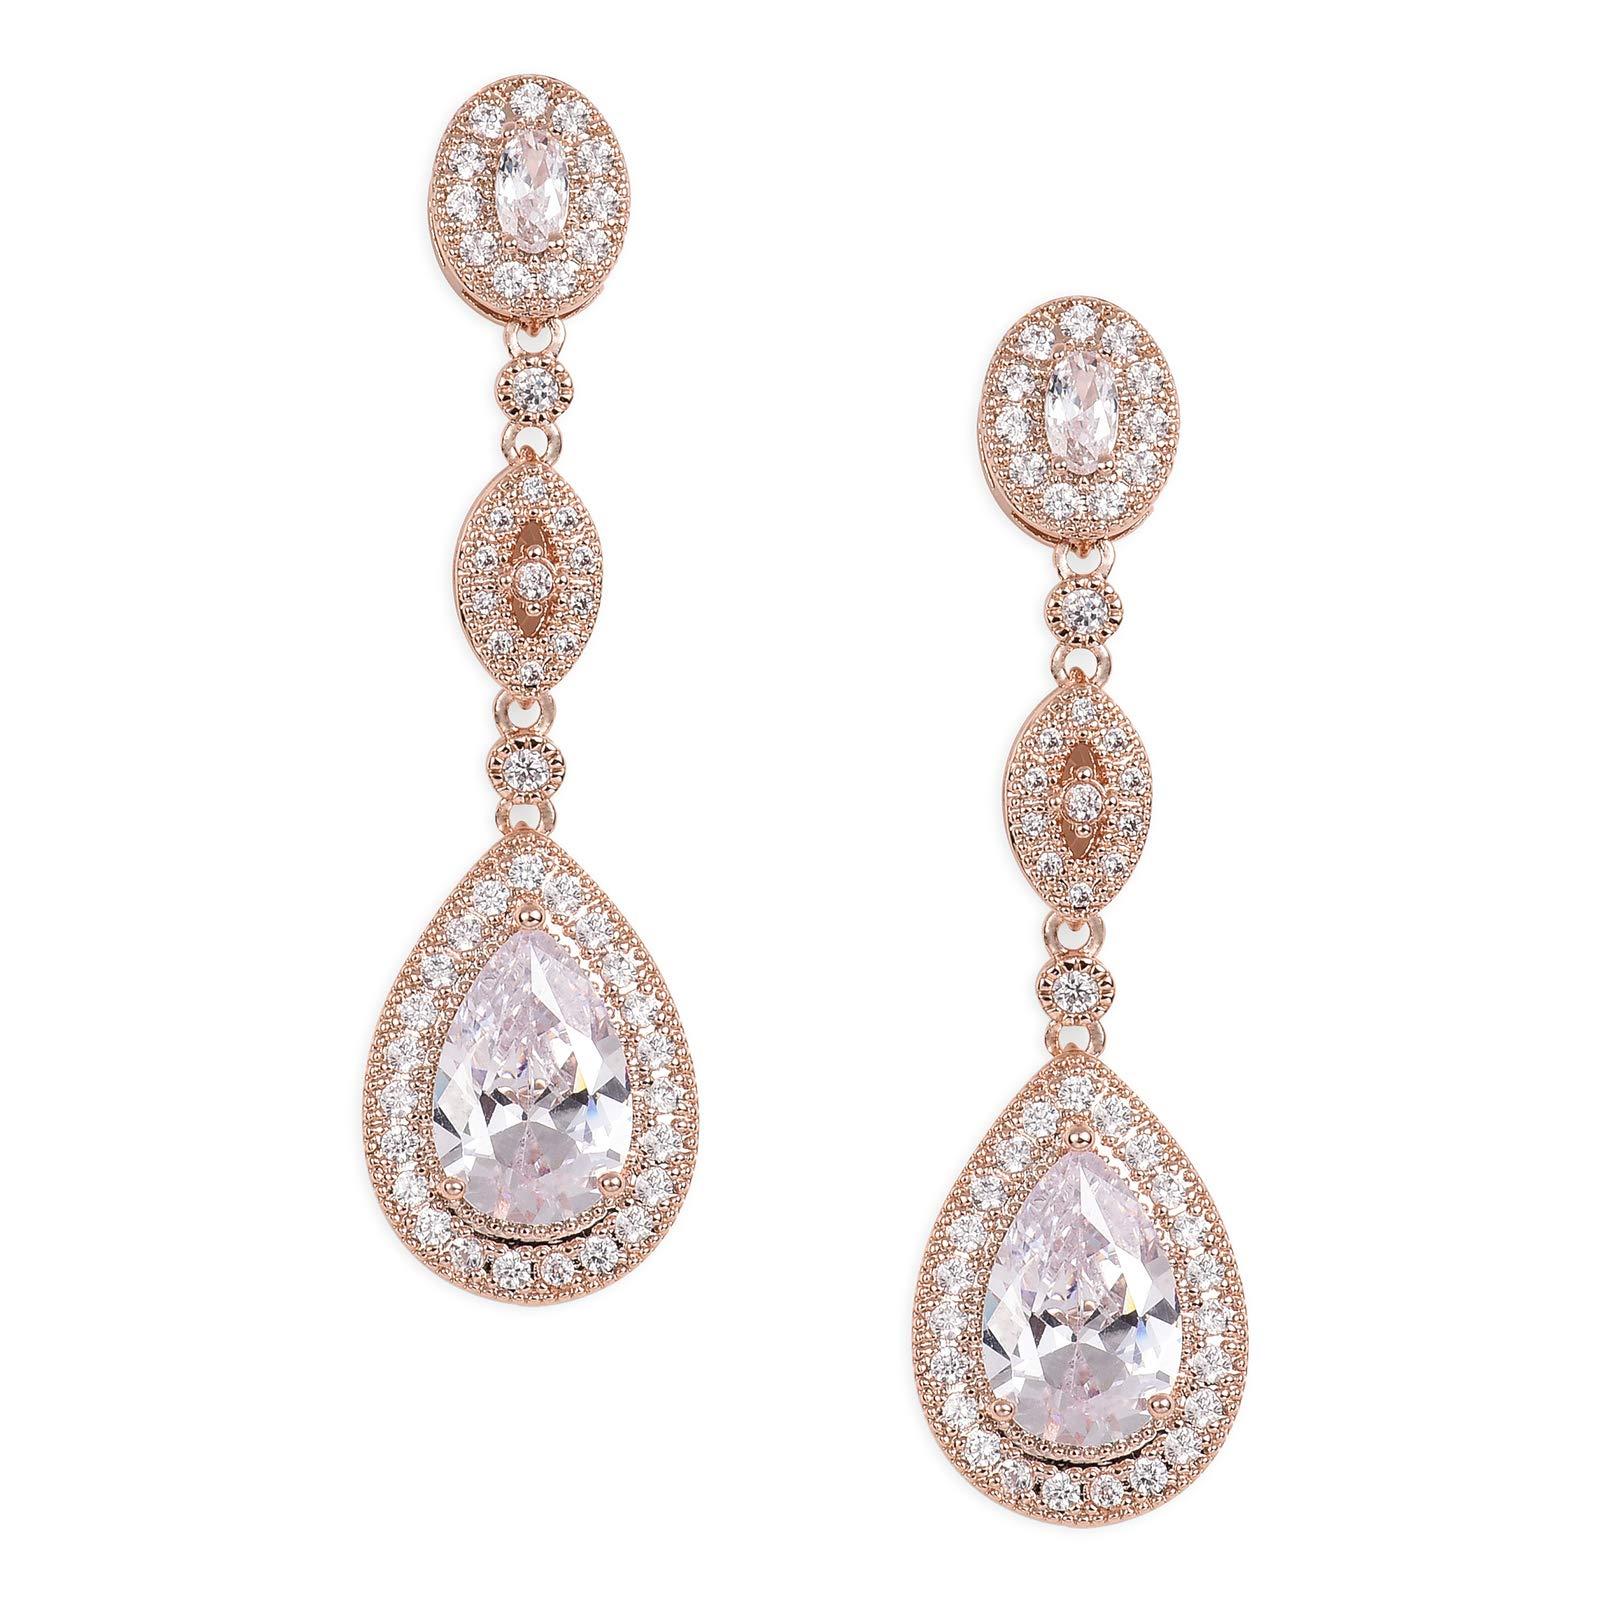 SWEETV Cubic Zirconia Teardrop Wedding Bridal Earrings for Women,Bridesmaids,Brides - Rose Gold Crystal Rhinestones Dangling Earrings Jewelry by SWEETV